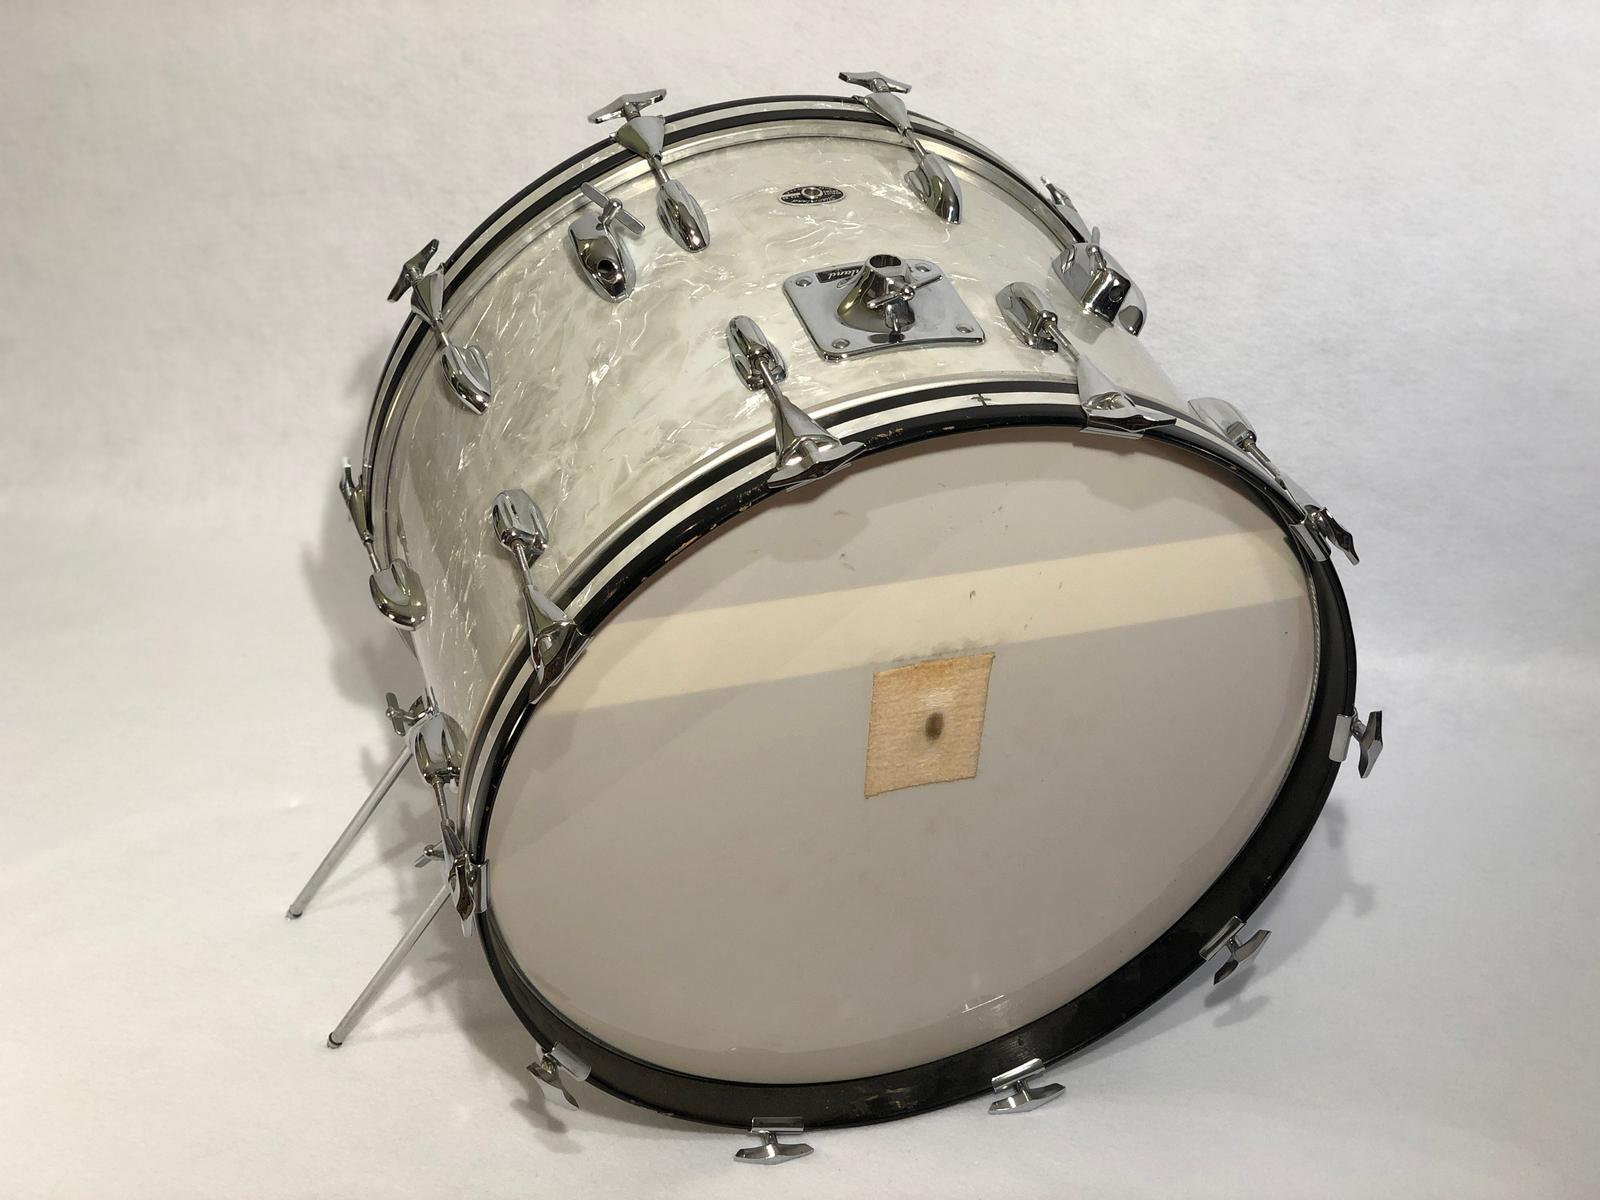 Gene Krupa, famous vintage drums, vintage drum collector, Gene Krupa's drums, Slingerland, Benny Goodman, antique collectibles, jazz memorabilia, instrument collection